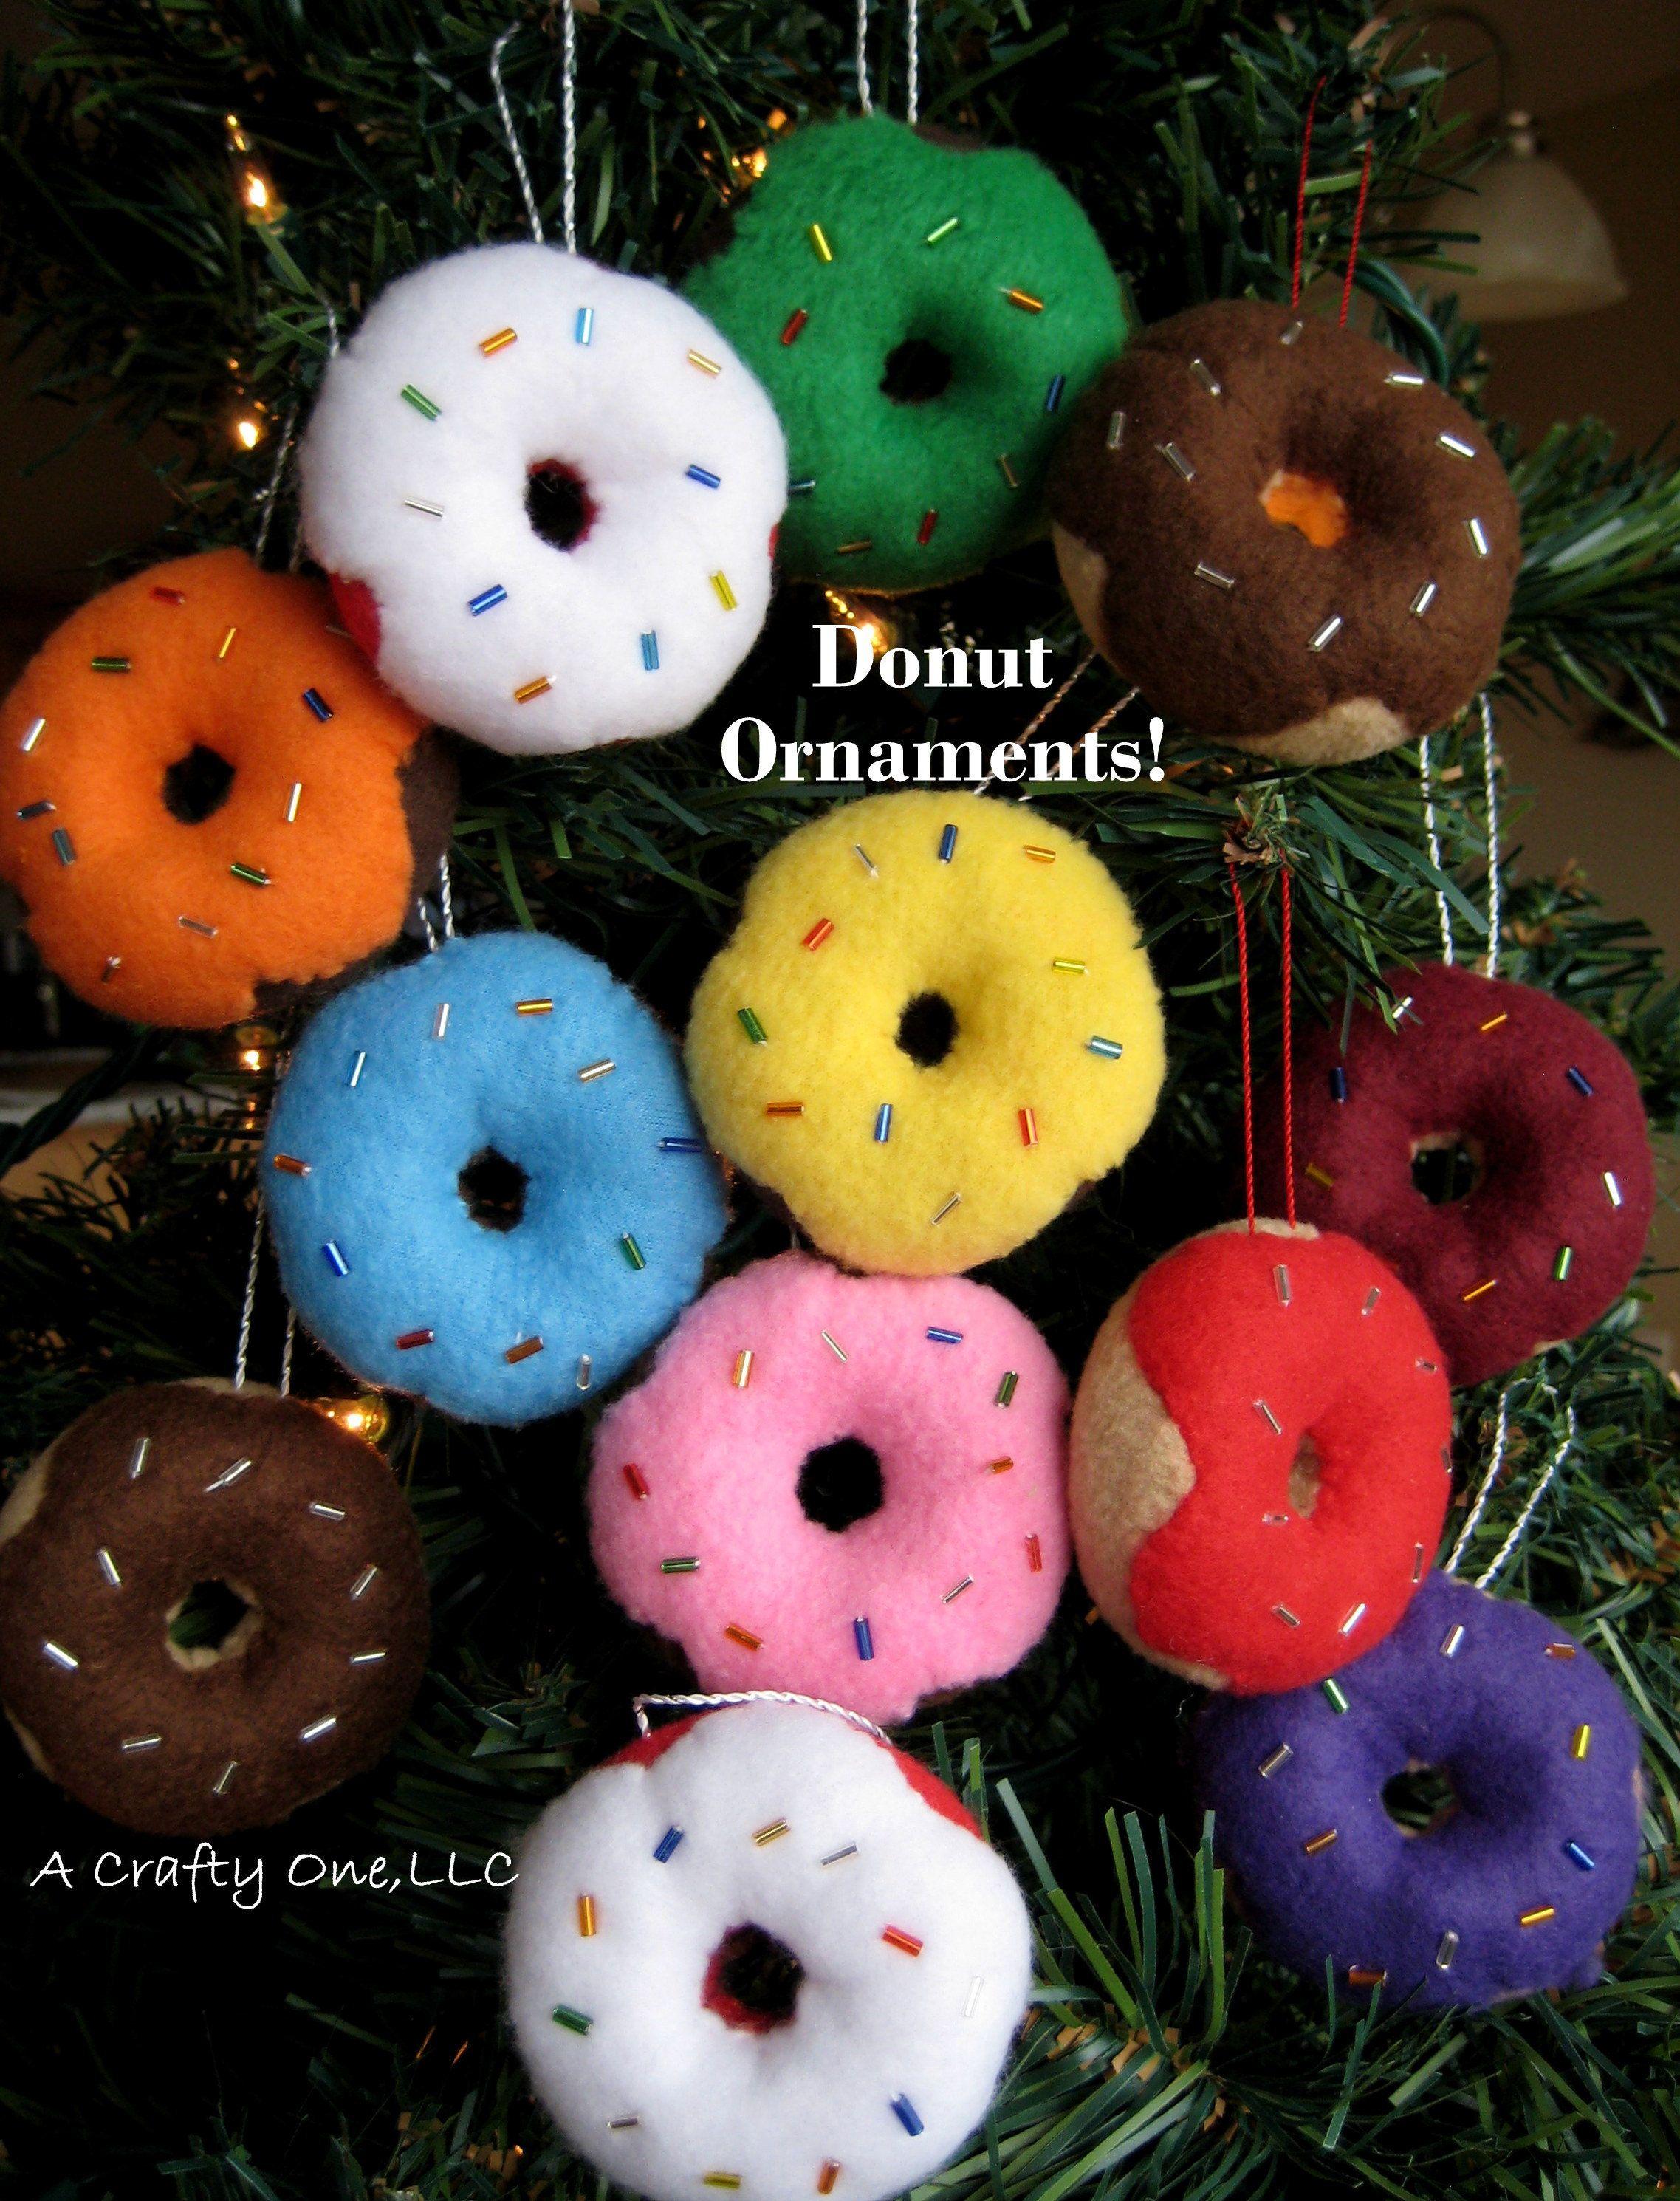 Donut Ornament Christmas Food Ornament Donut Set Of 6 Or 12 Christmas Felt Donuts Bakery Ornament Gift Foodie Gift Donut Lover Gift Cool Christmas Trees Christmas Fun Christmas Ornaments